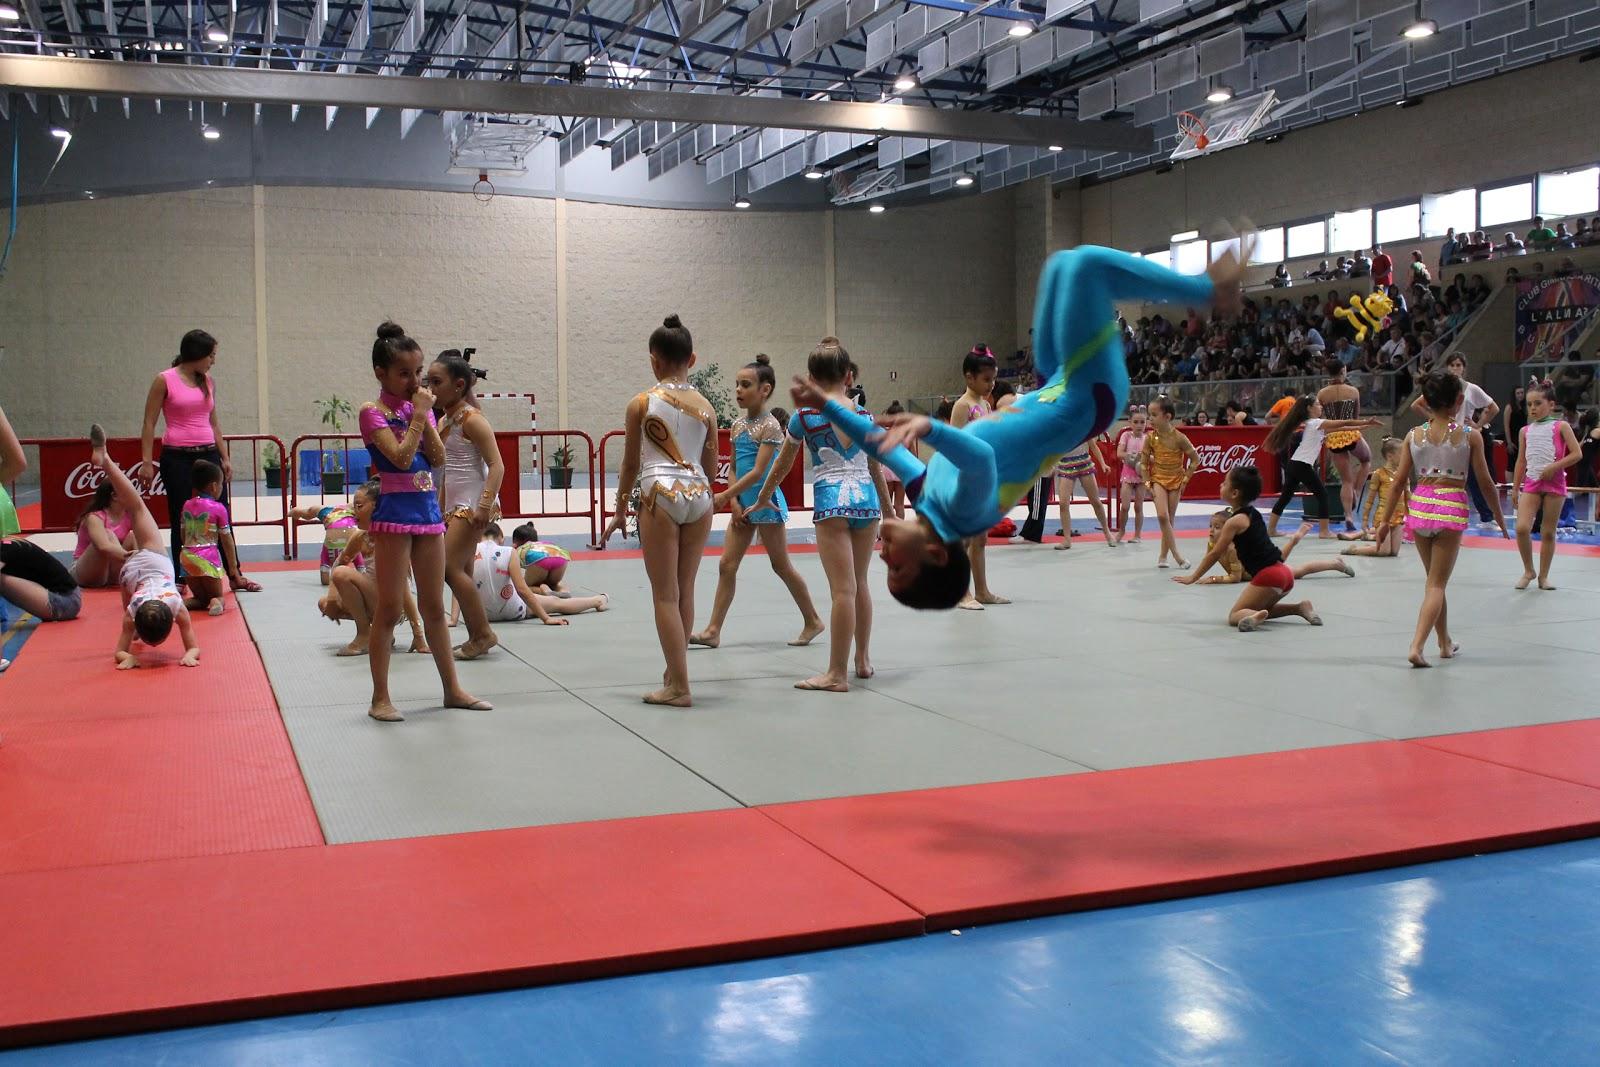 Club de gimnasia r tmica itveca 1 fase interclubs for Club gimnasio